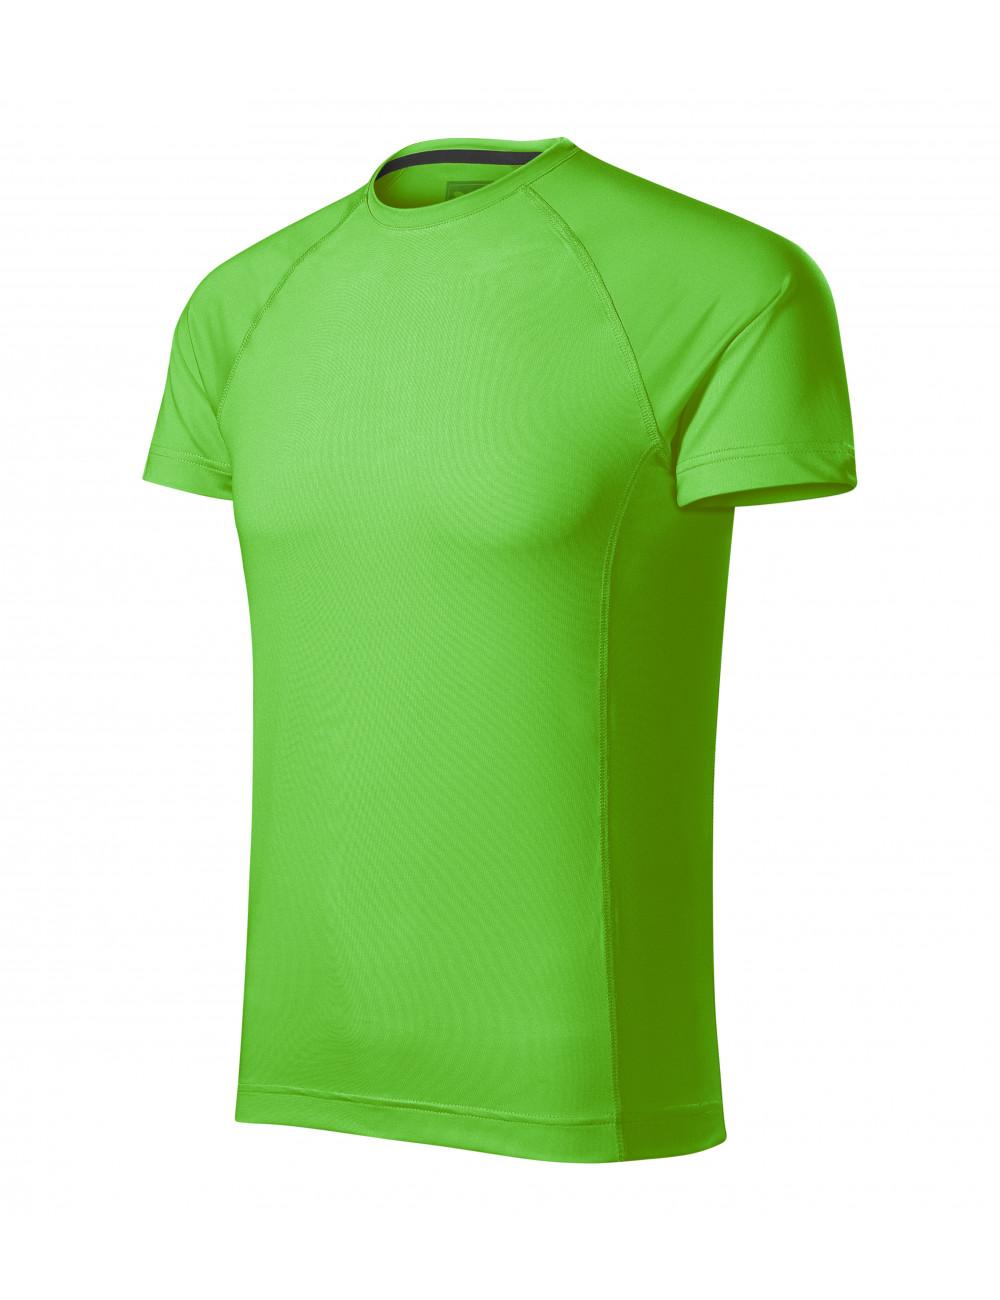 Adler MALFINI Koszulka męska Destiny 175 green apple